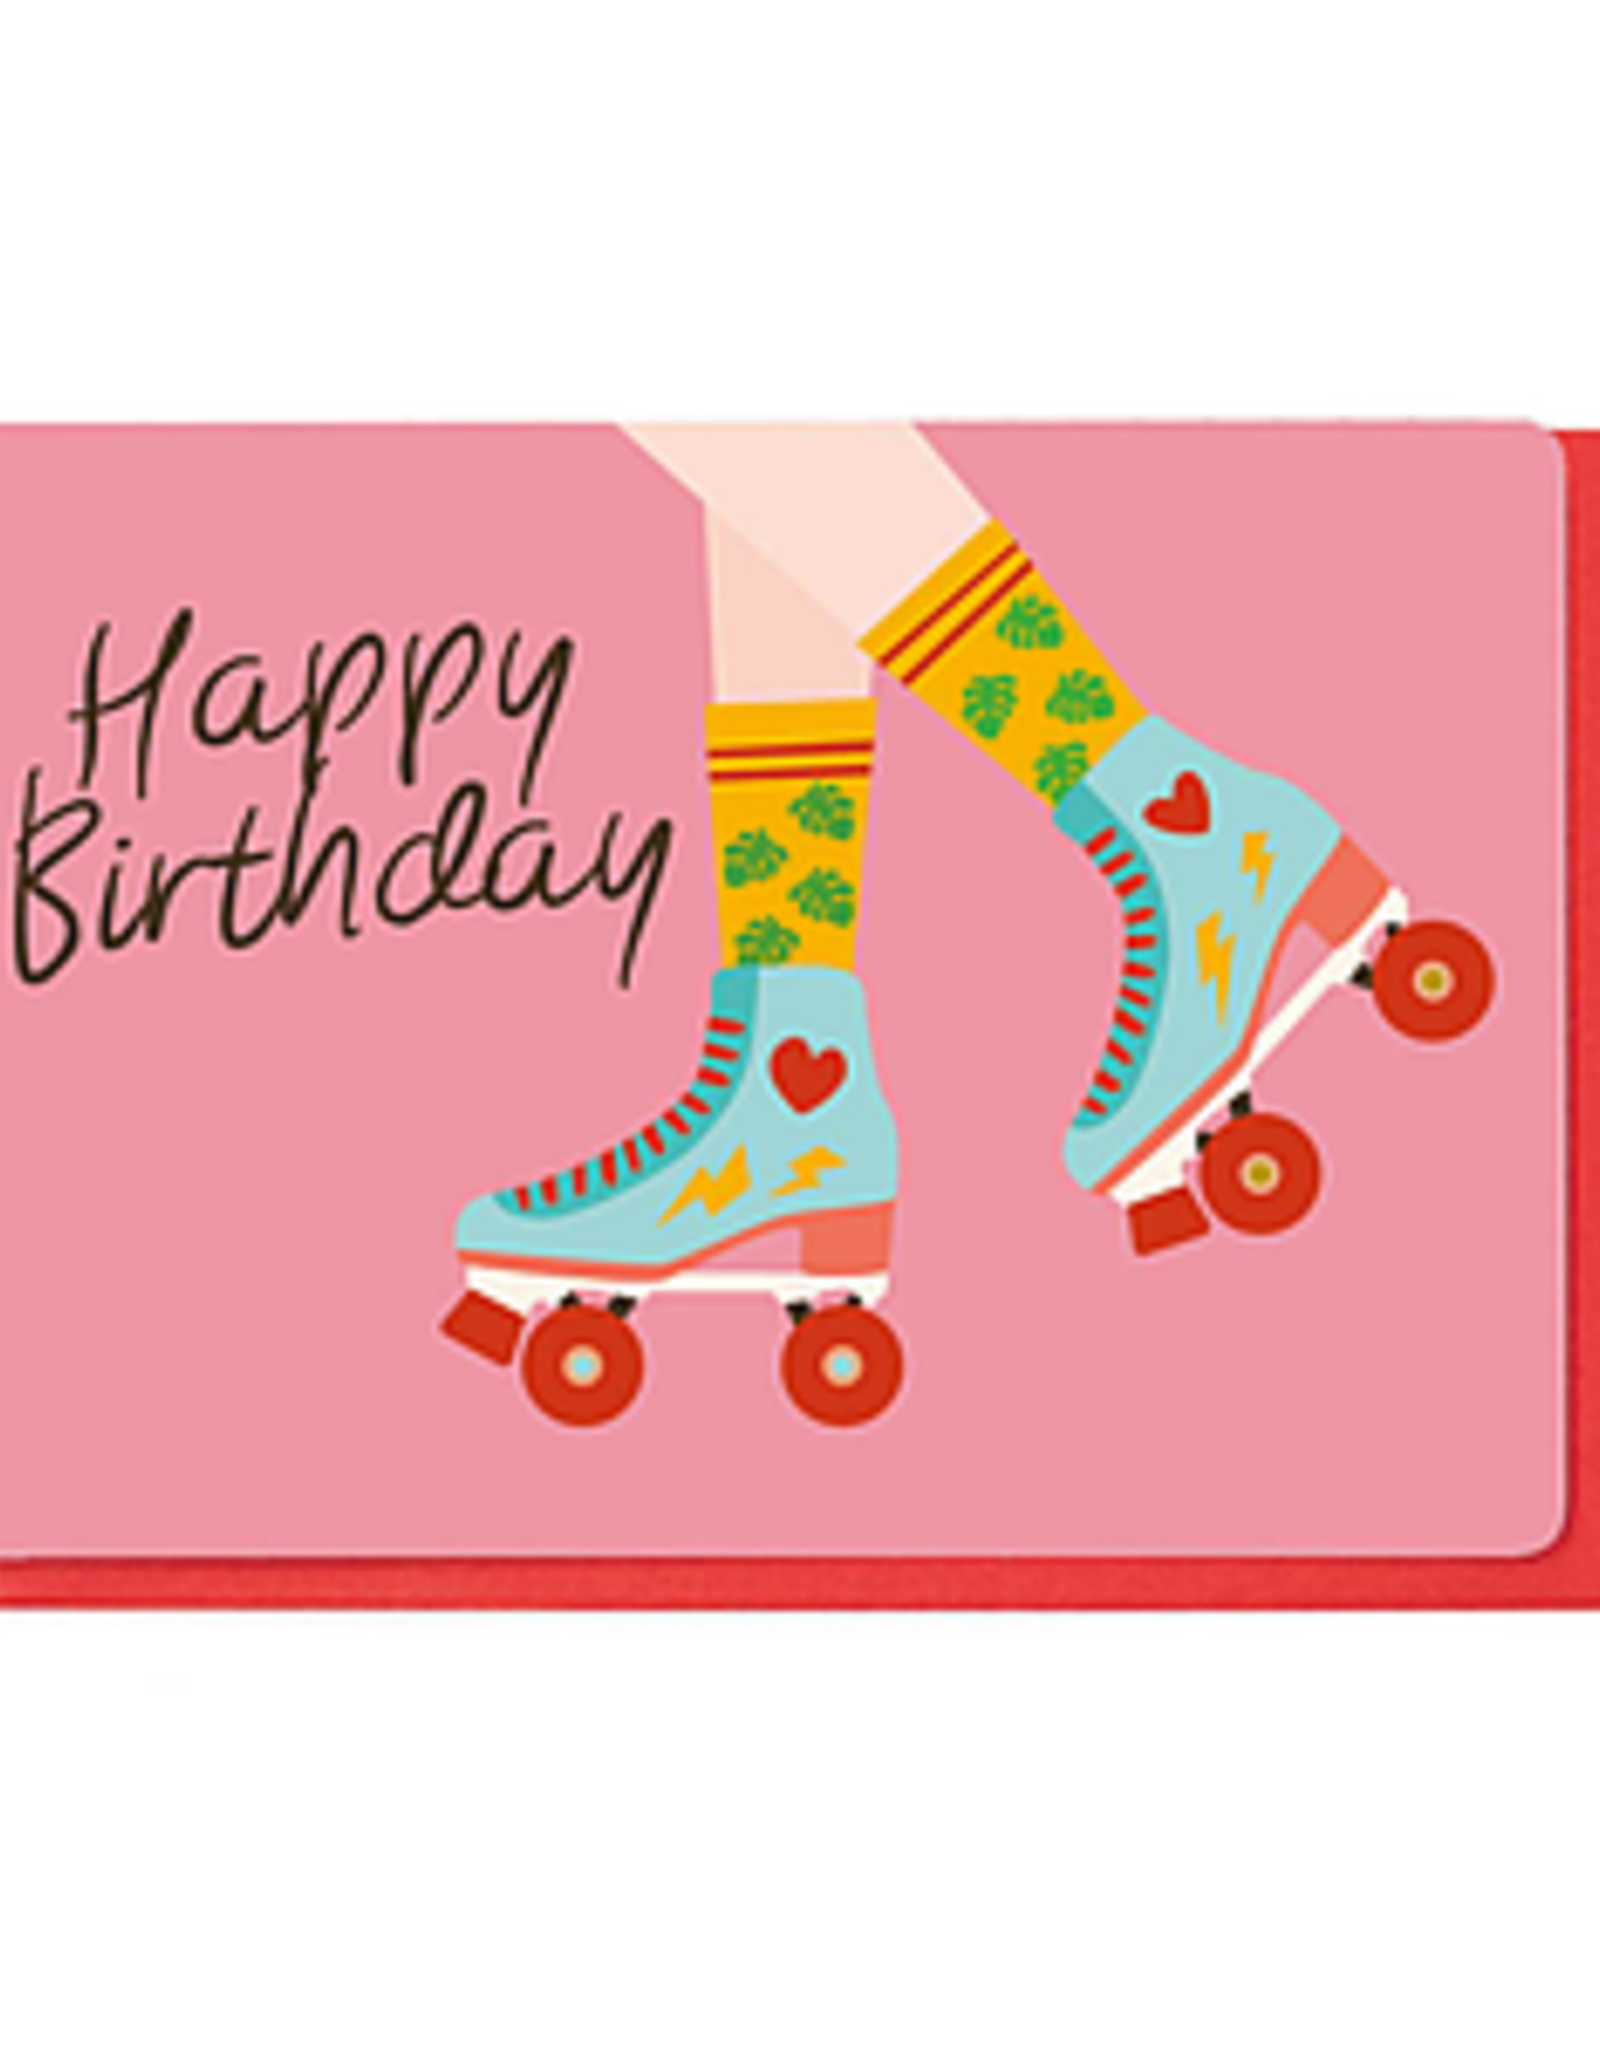 Enfant Terrible Dubbele wenskaart Enfant terrible: happy birthday rolschaatsen